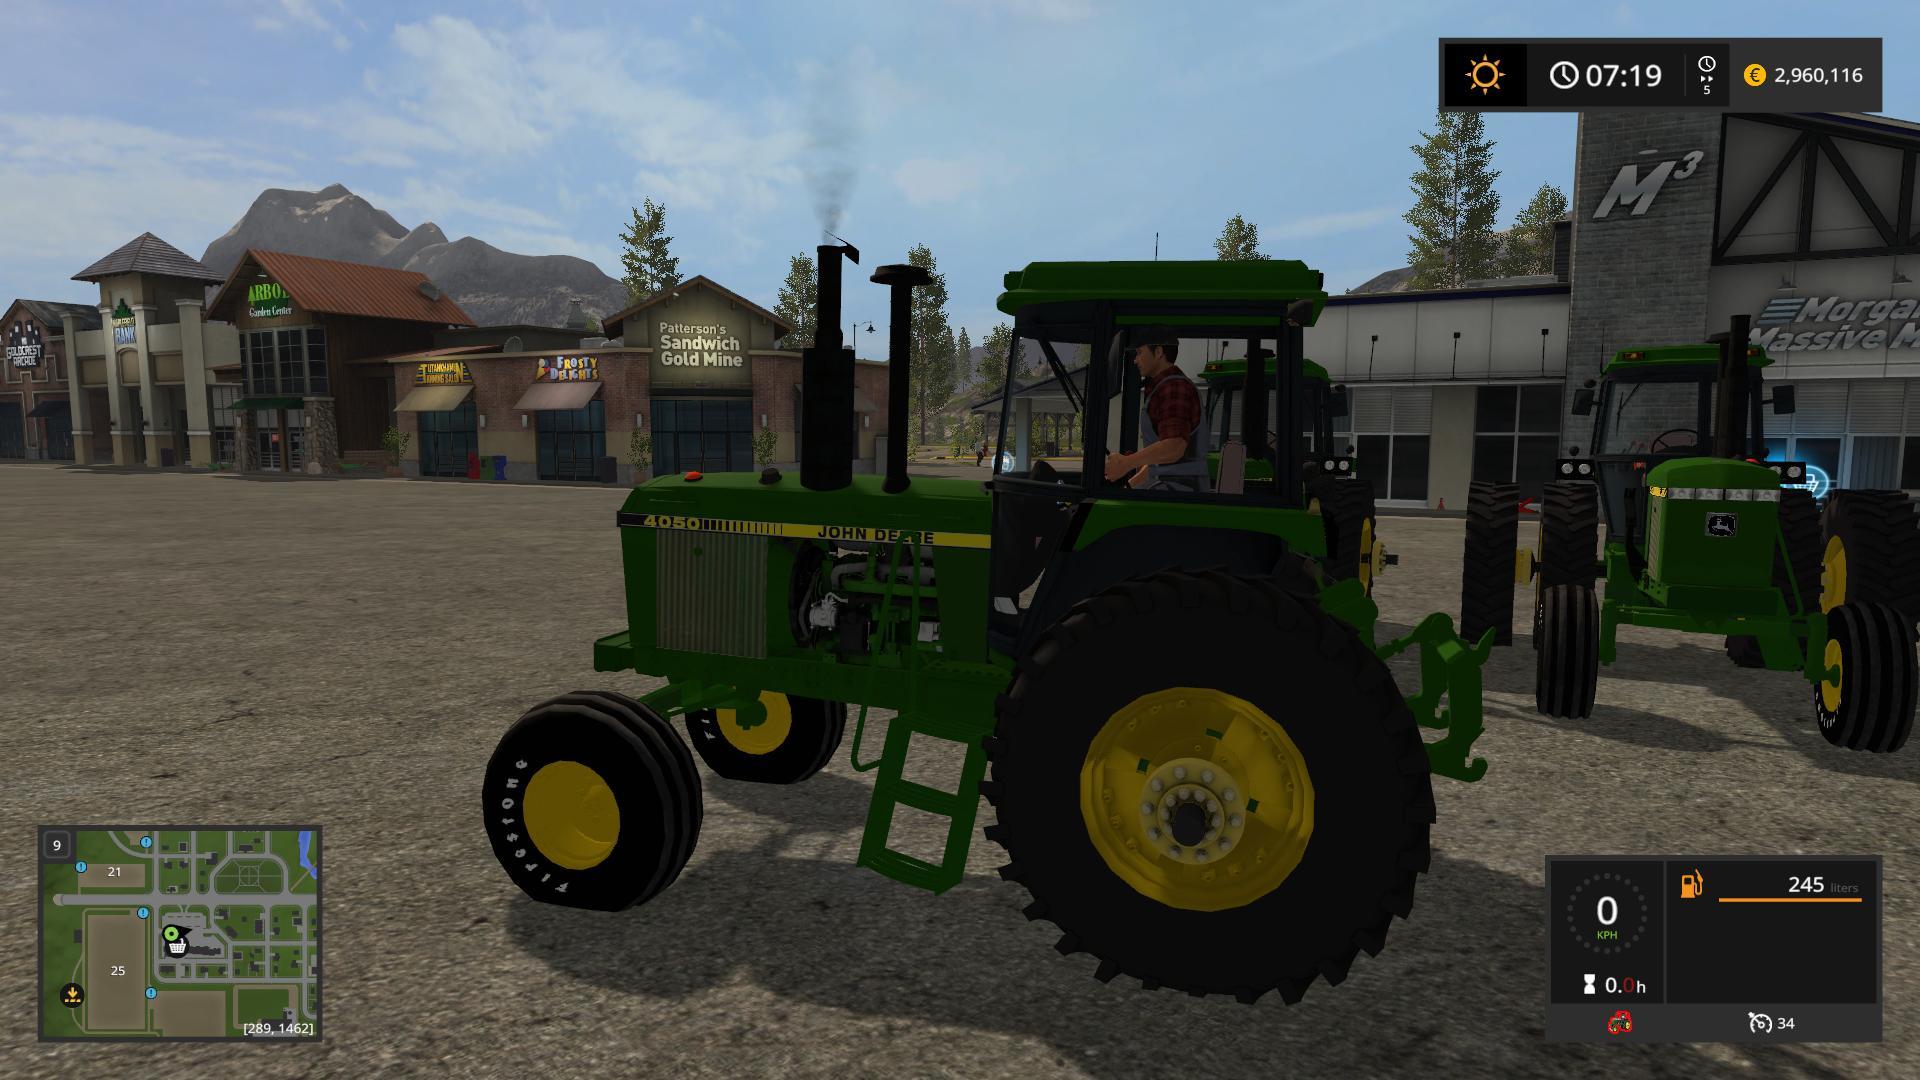 OLD IRON JD 55 SERIES 2WD V1 0 FS17 - Farming simulator 17 / 2017 mod